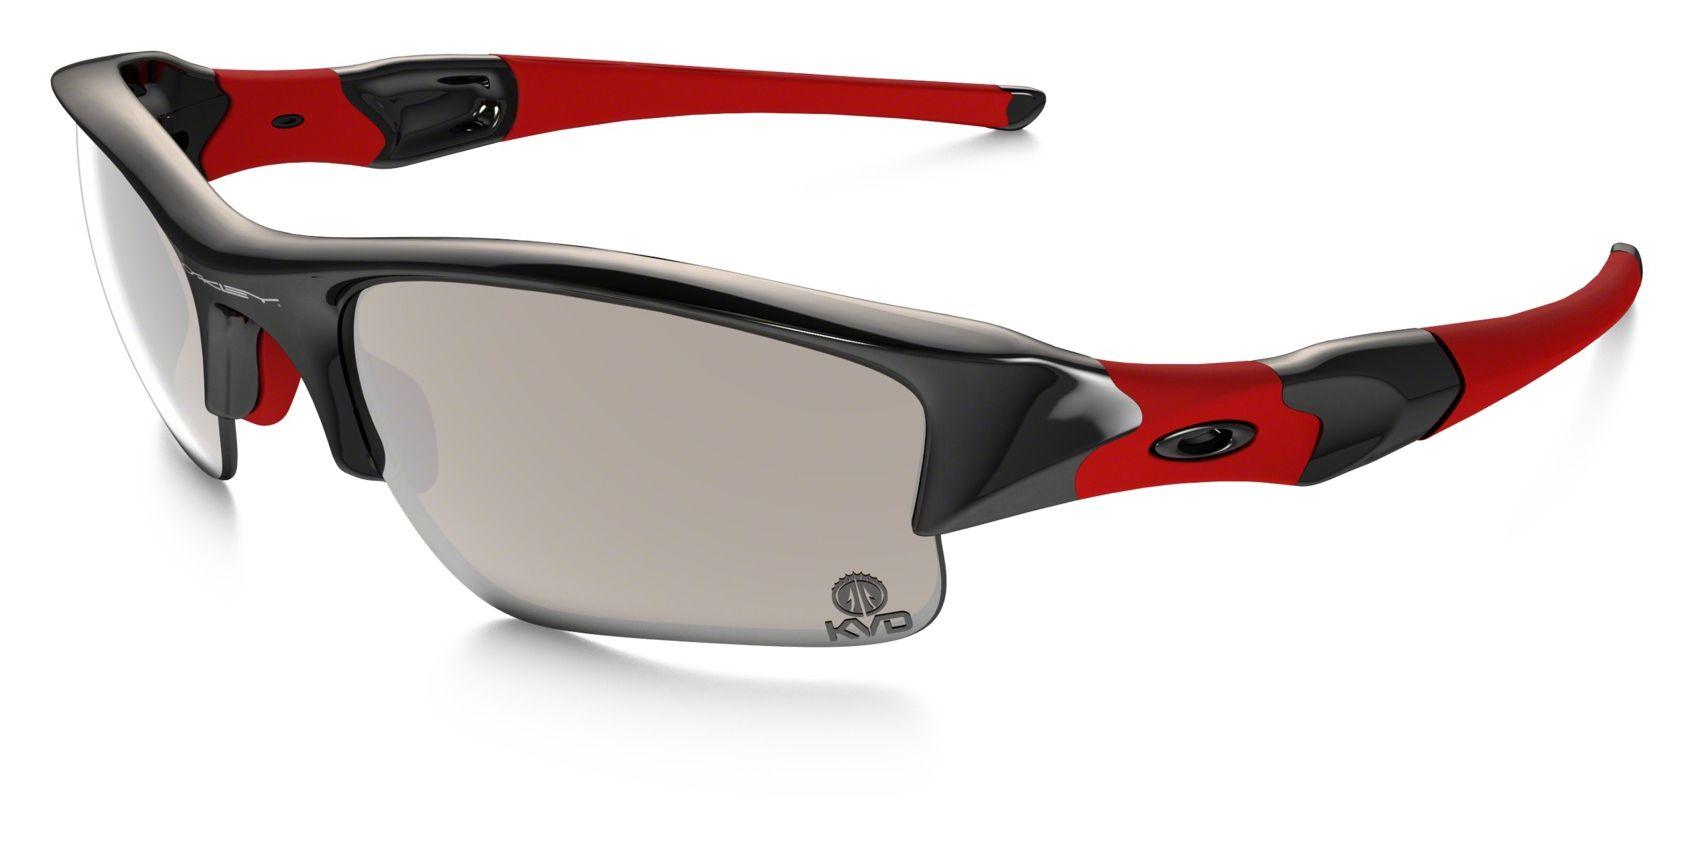 1ac7409f6234 Oakley Flak Jacket Xlj Sunglasses Reviews « Heritage Malta